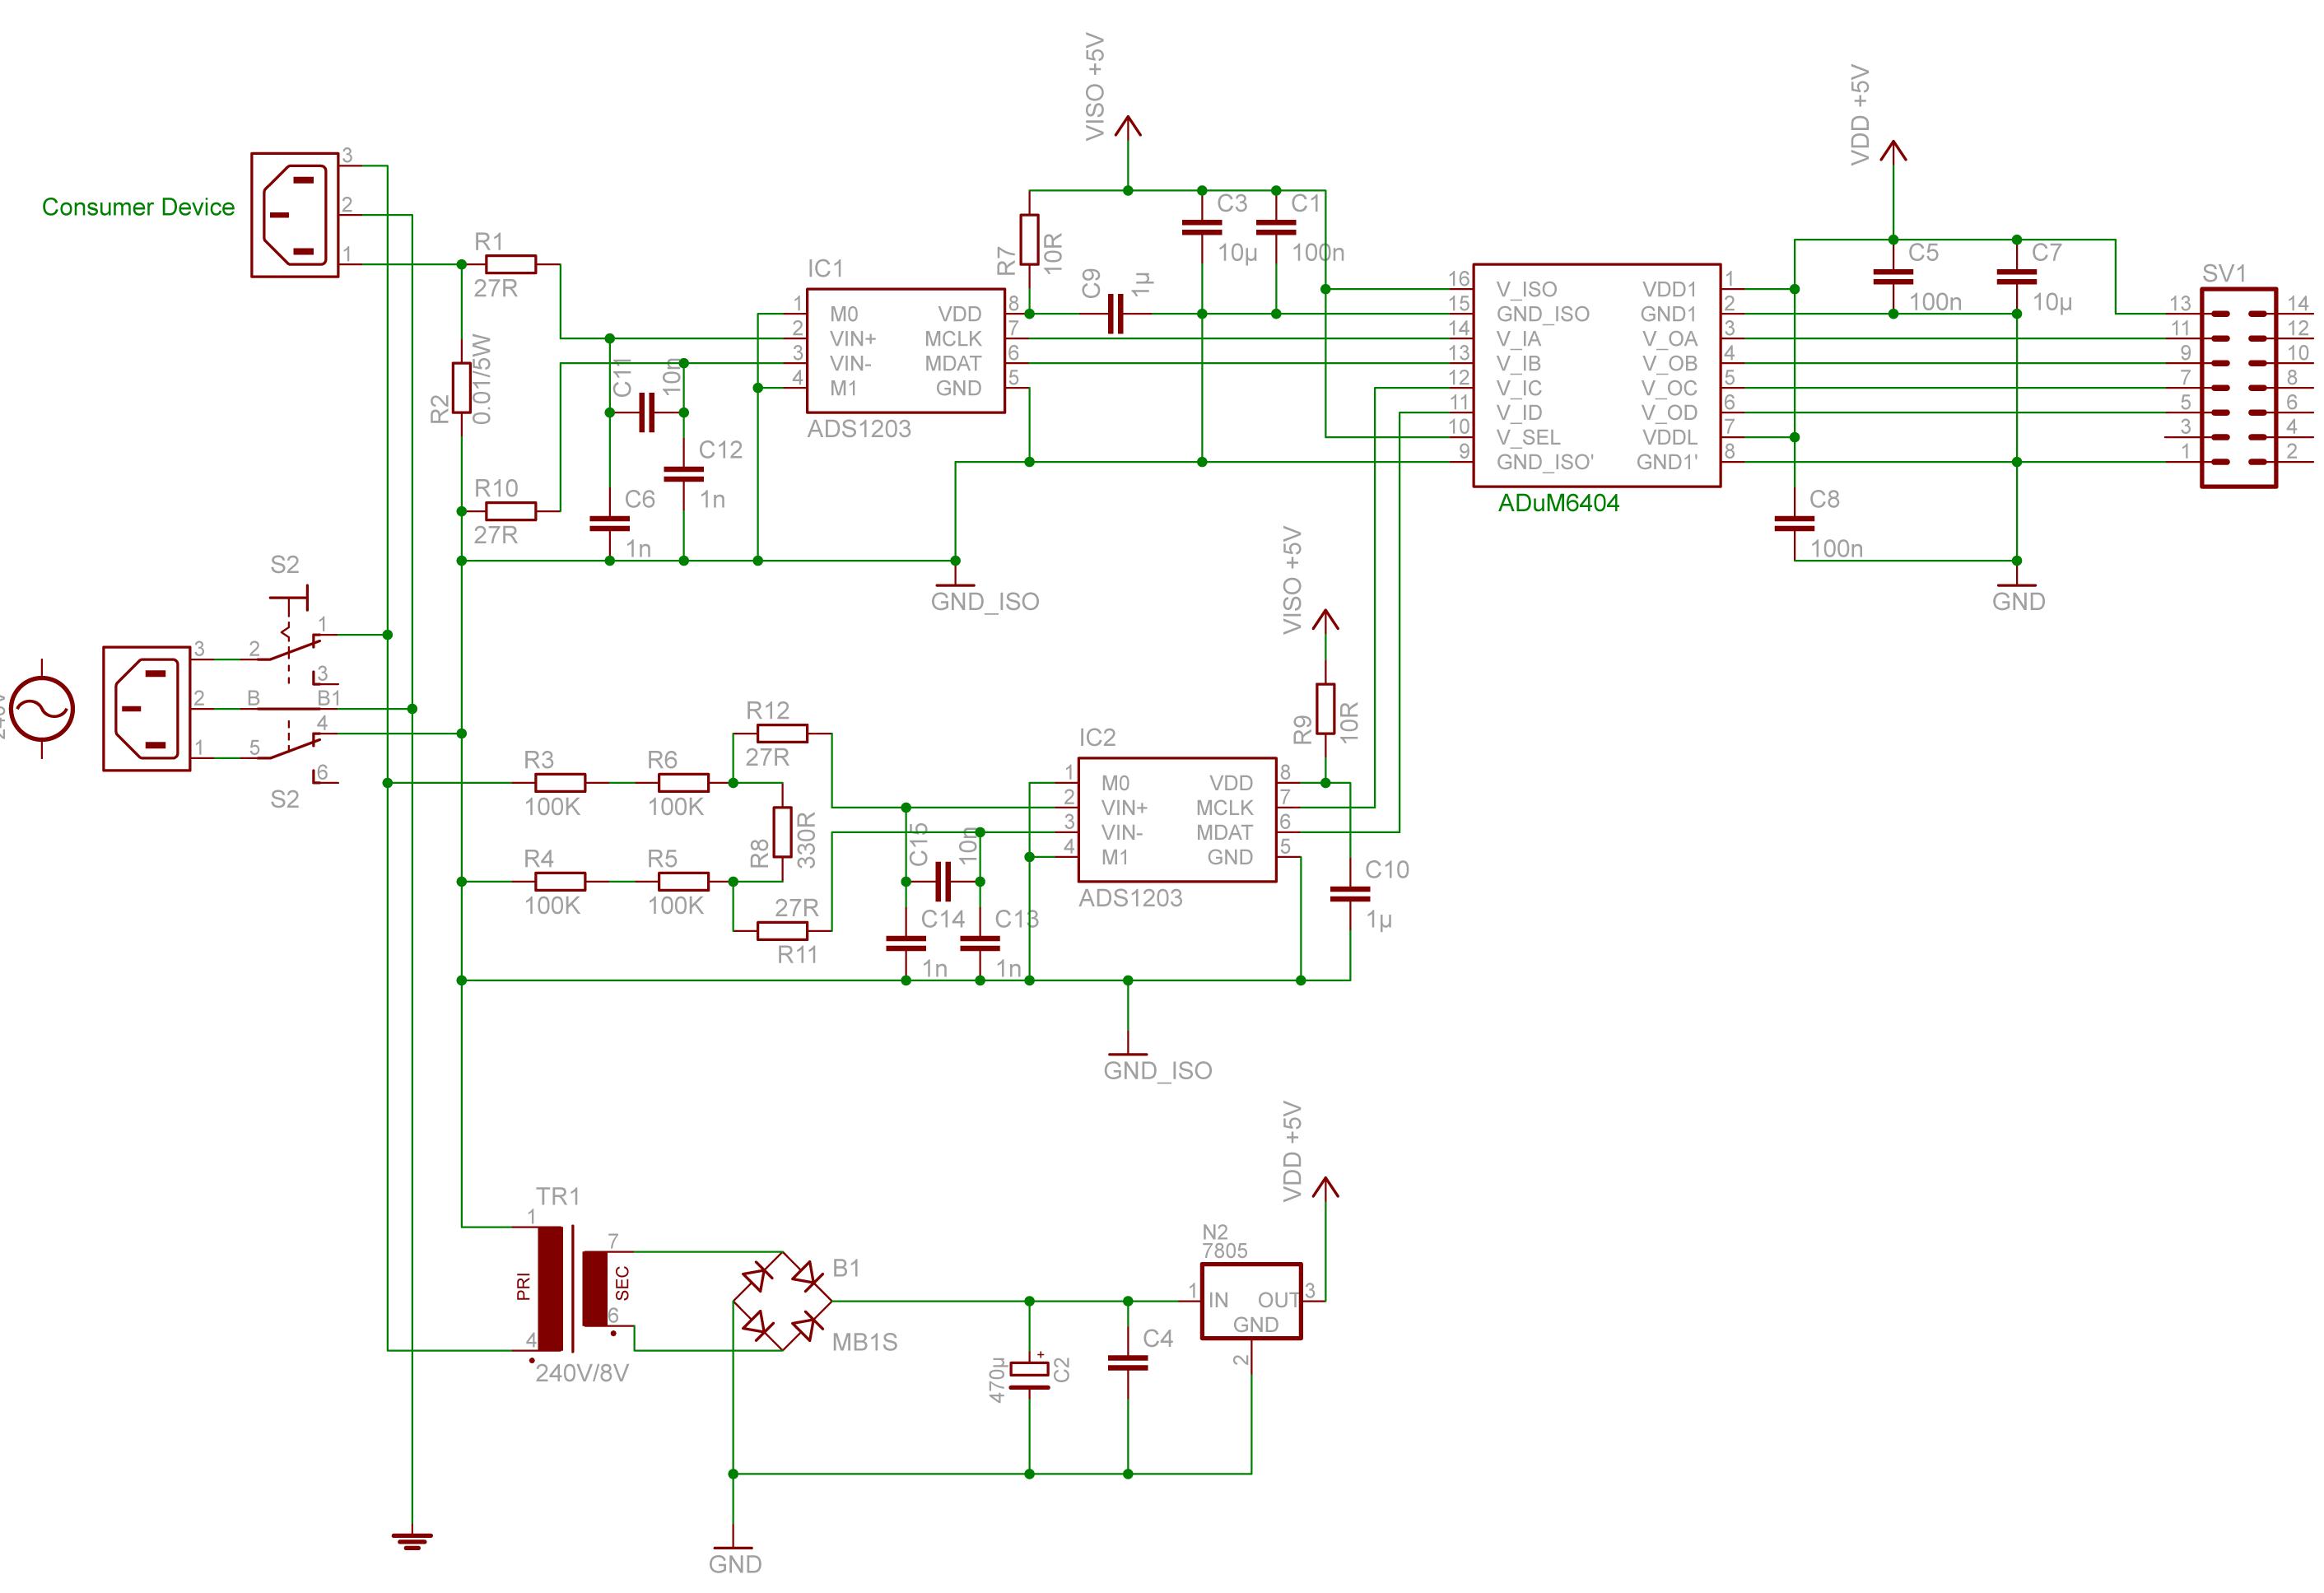 Strommessung 220V 16A - Mikrocontroller.net